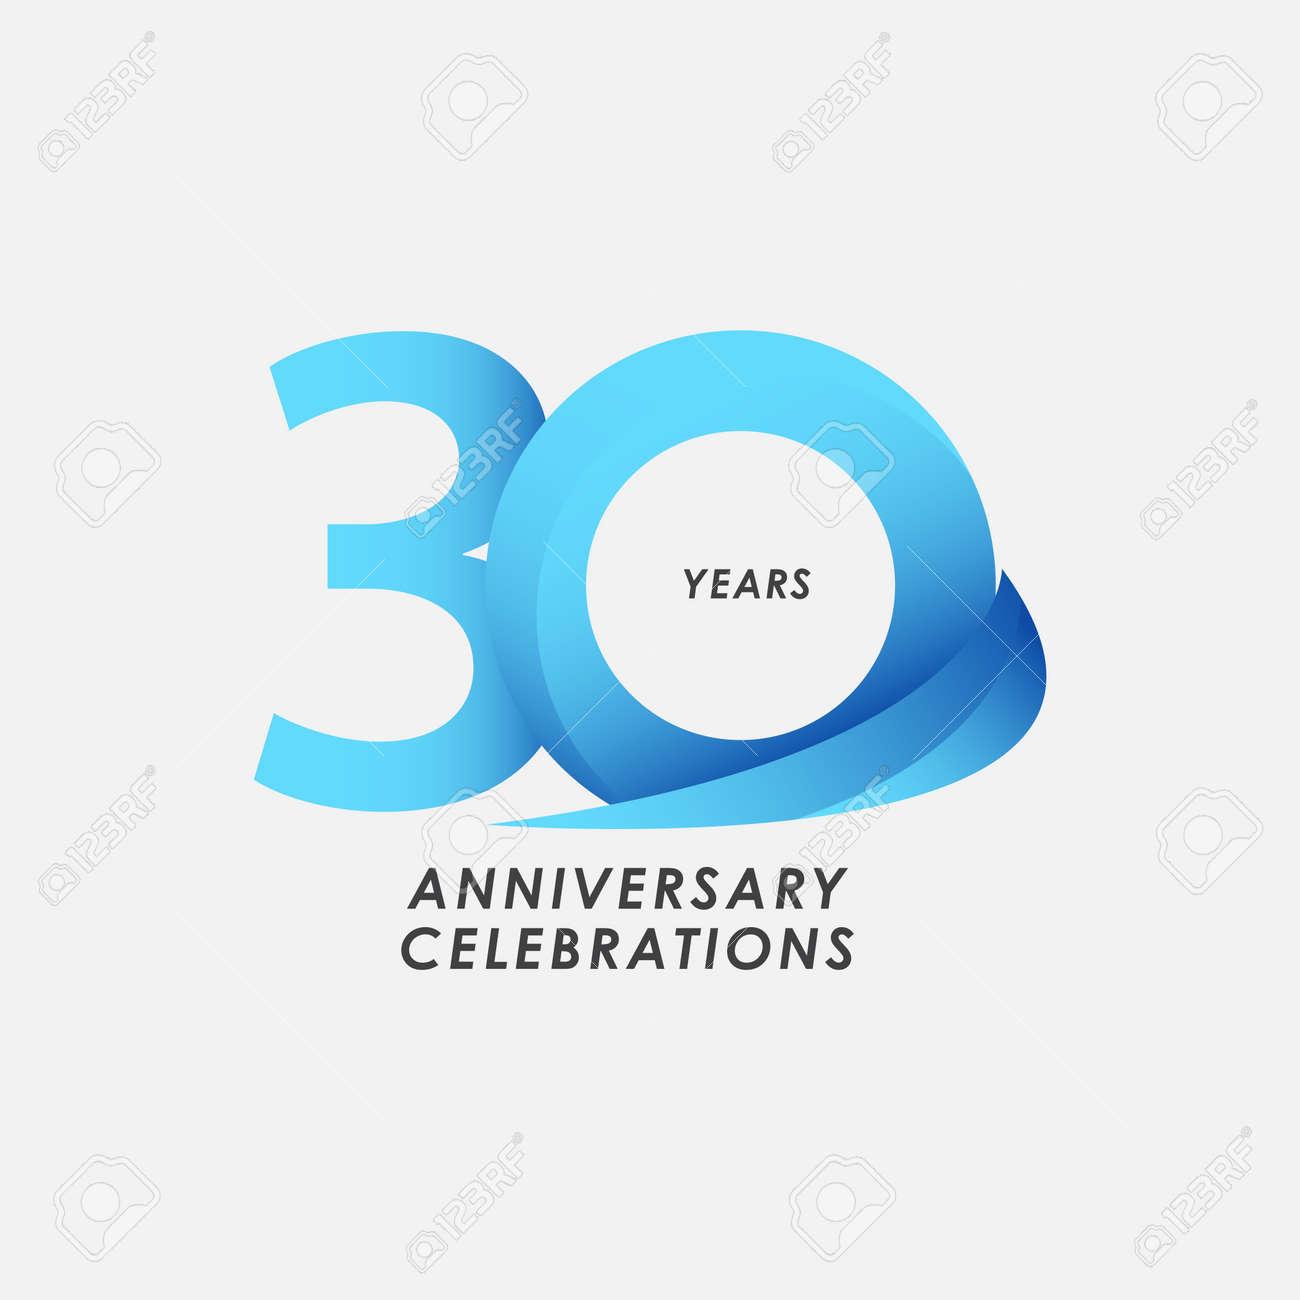 30 Years Anniversary Celebrations Vector Template Design Illustration - 163697966